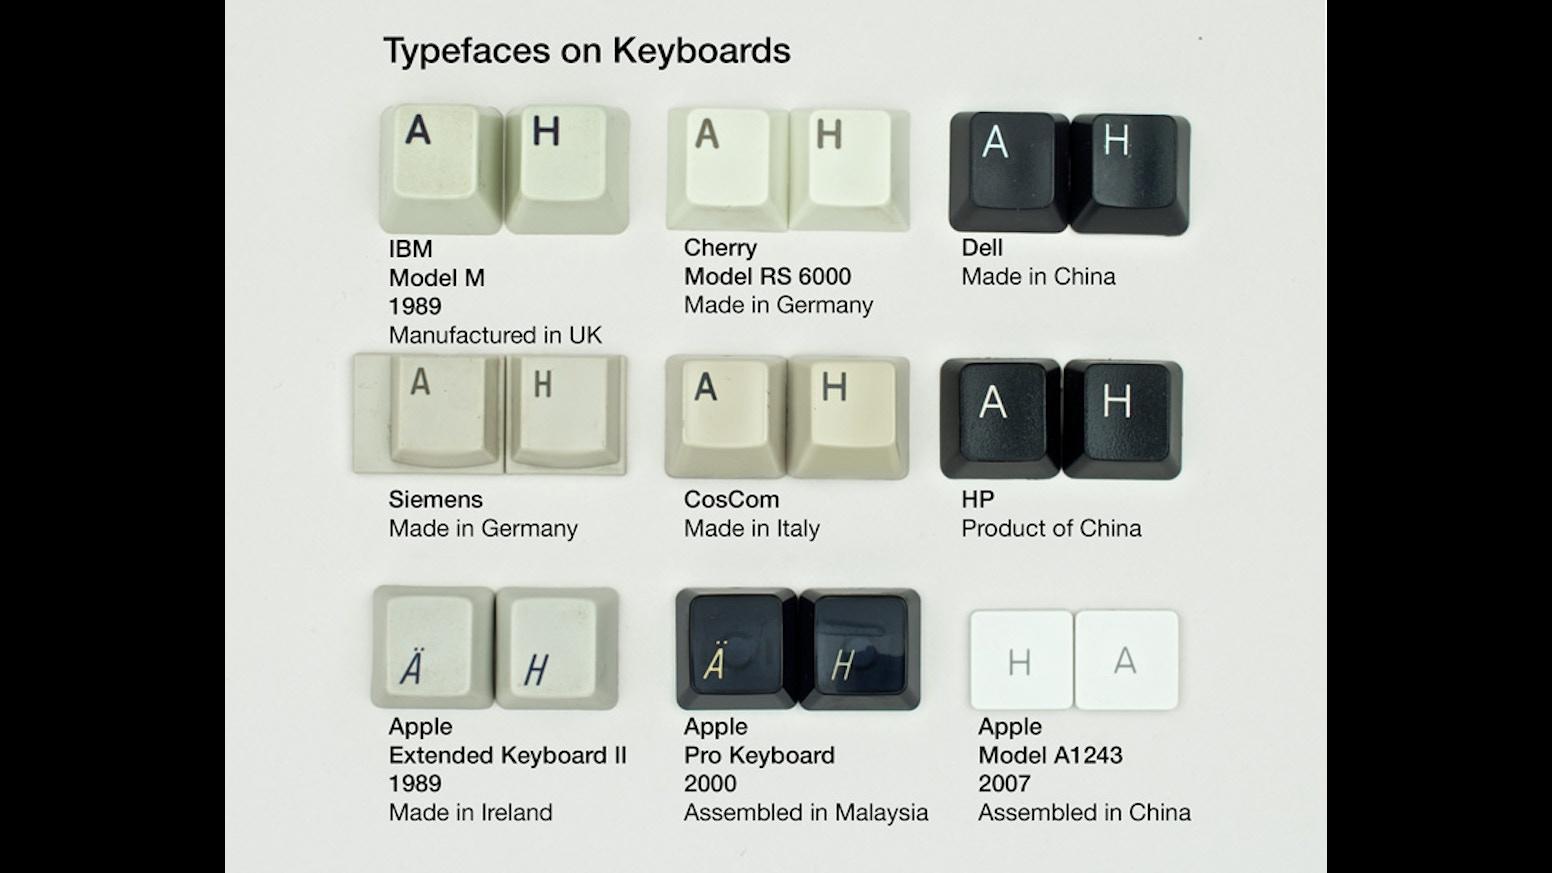 Calendar Typography Map : Typographic wall calendar by harald geisler —kickstarter